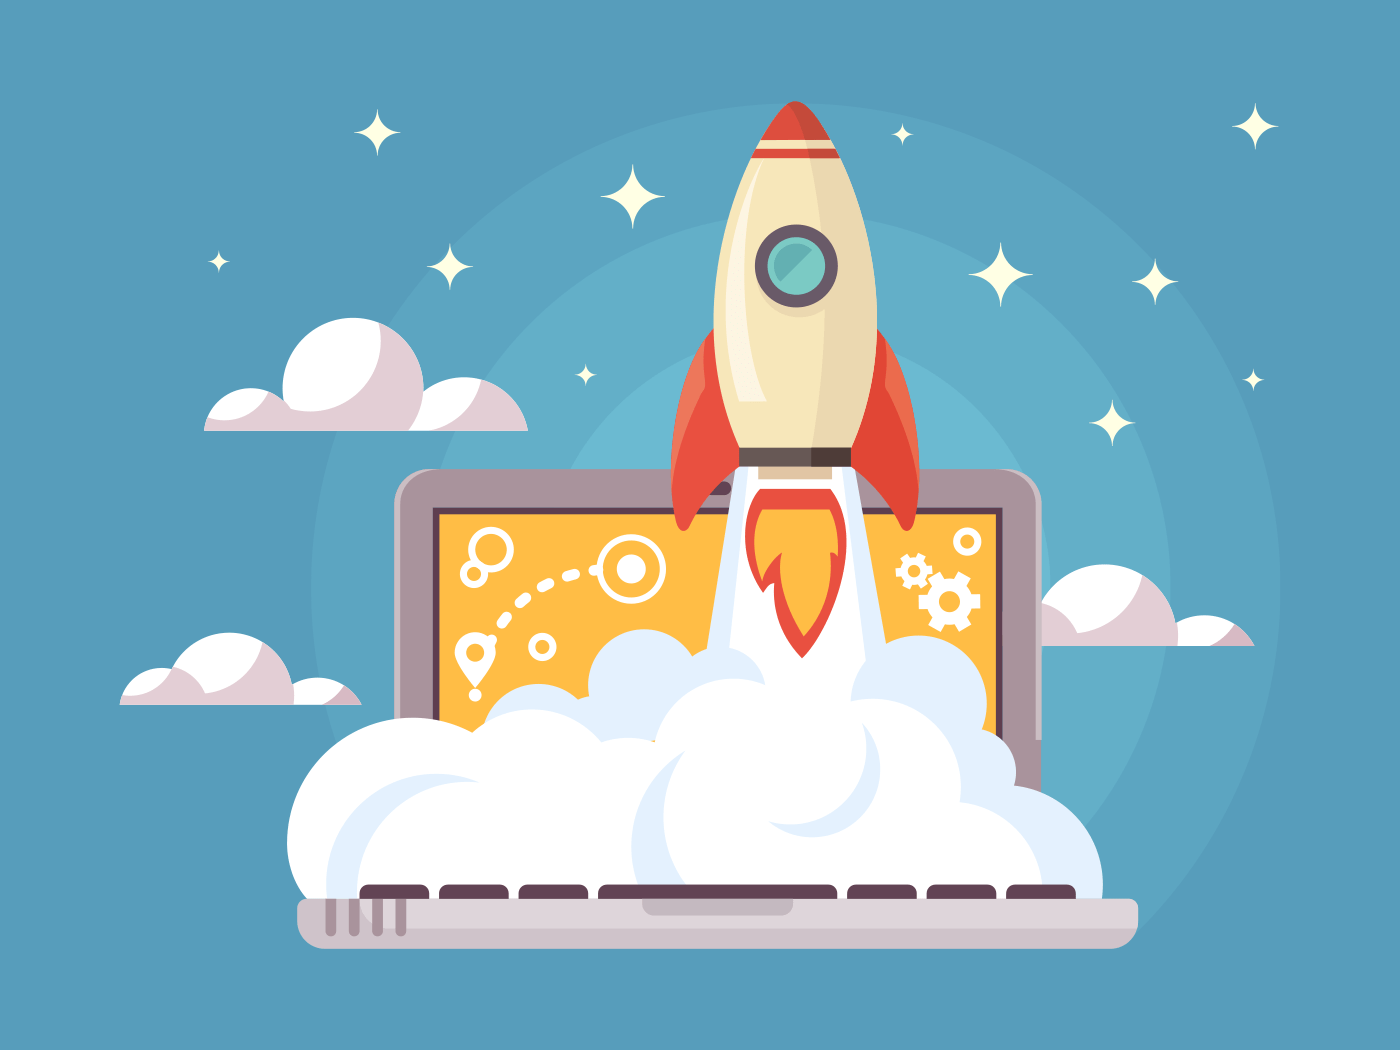 Web start up vector illustration